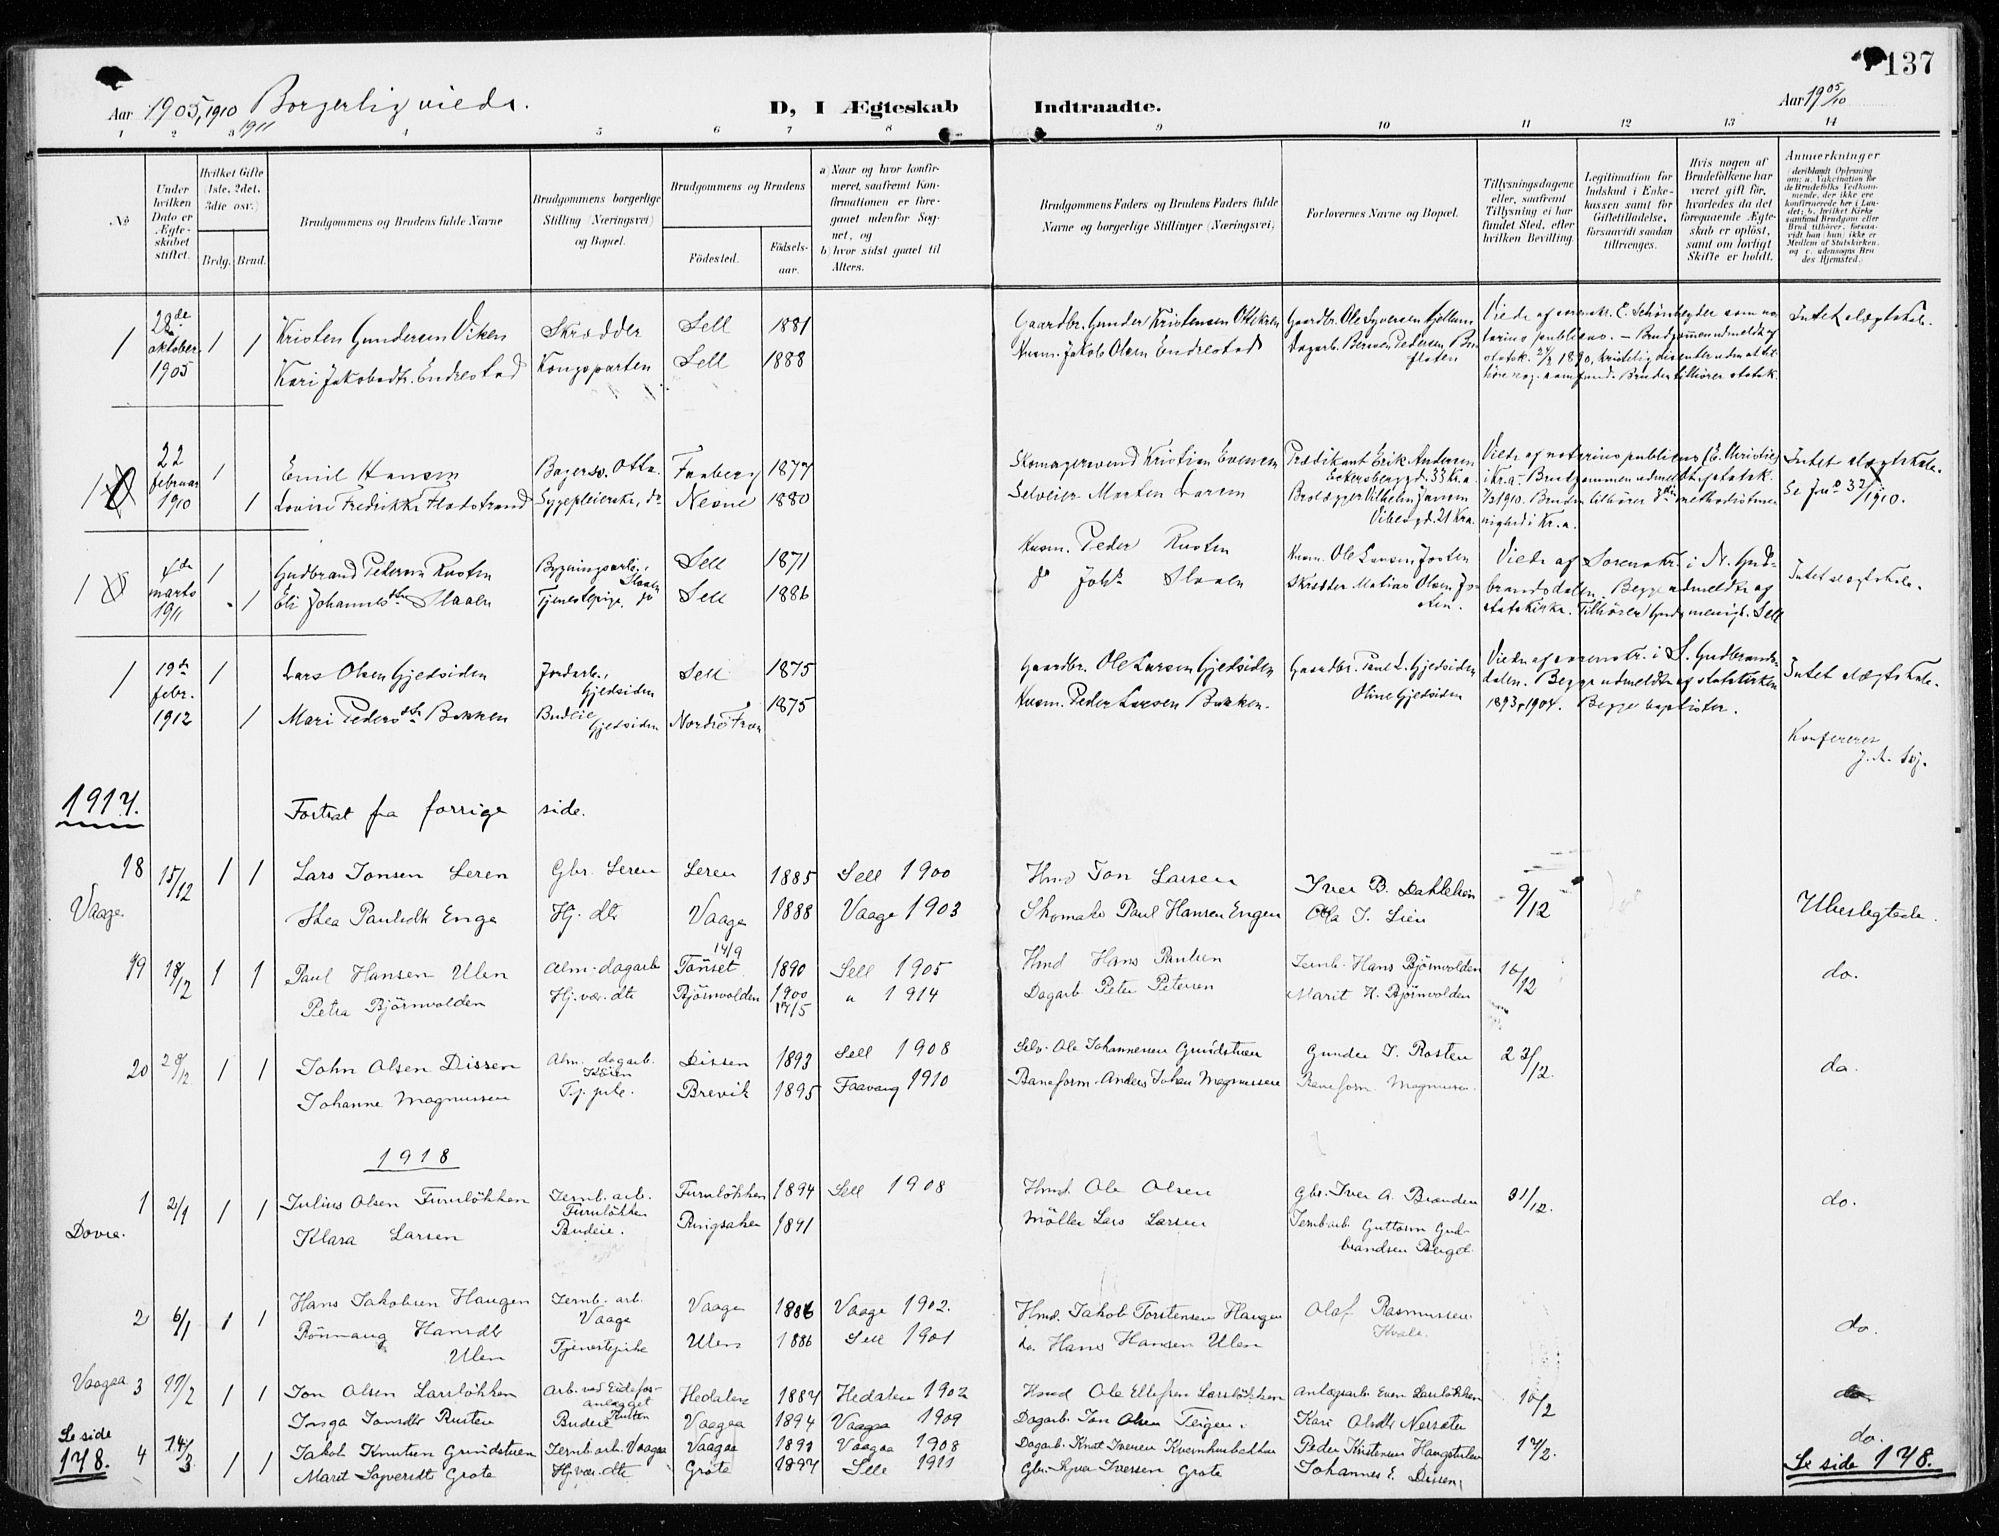 SAH, Sel prestekontor, Parish register (official) no. 2, 1905-1919, p. 137